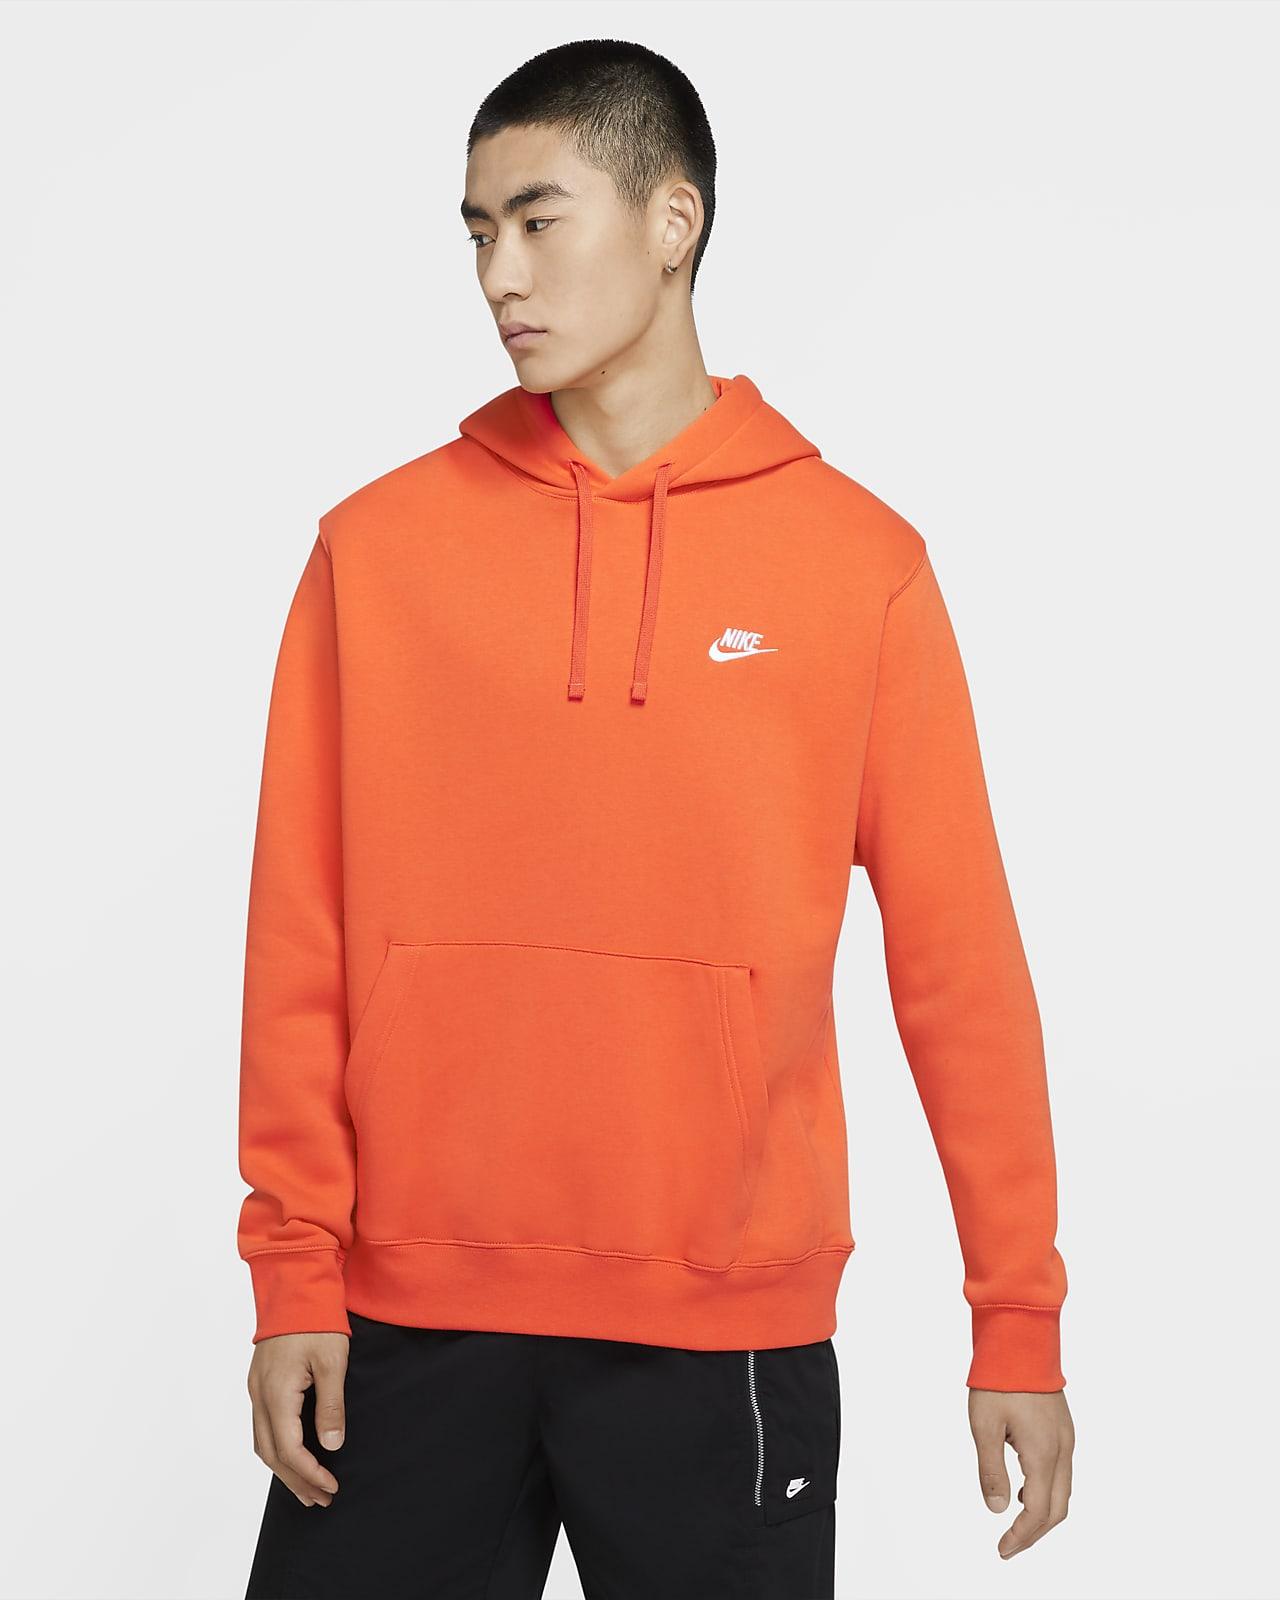 Huvtröja Nike Sportswear Club Fleece